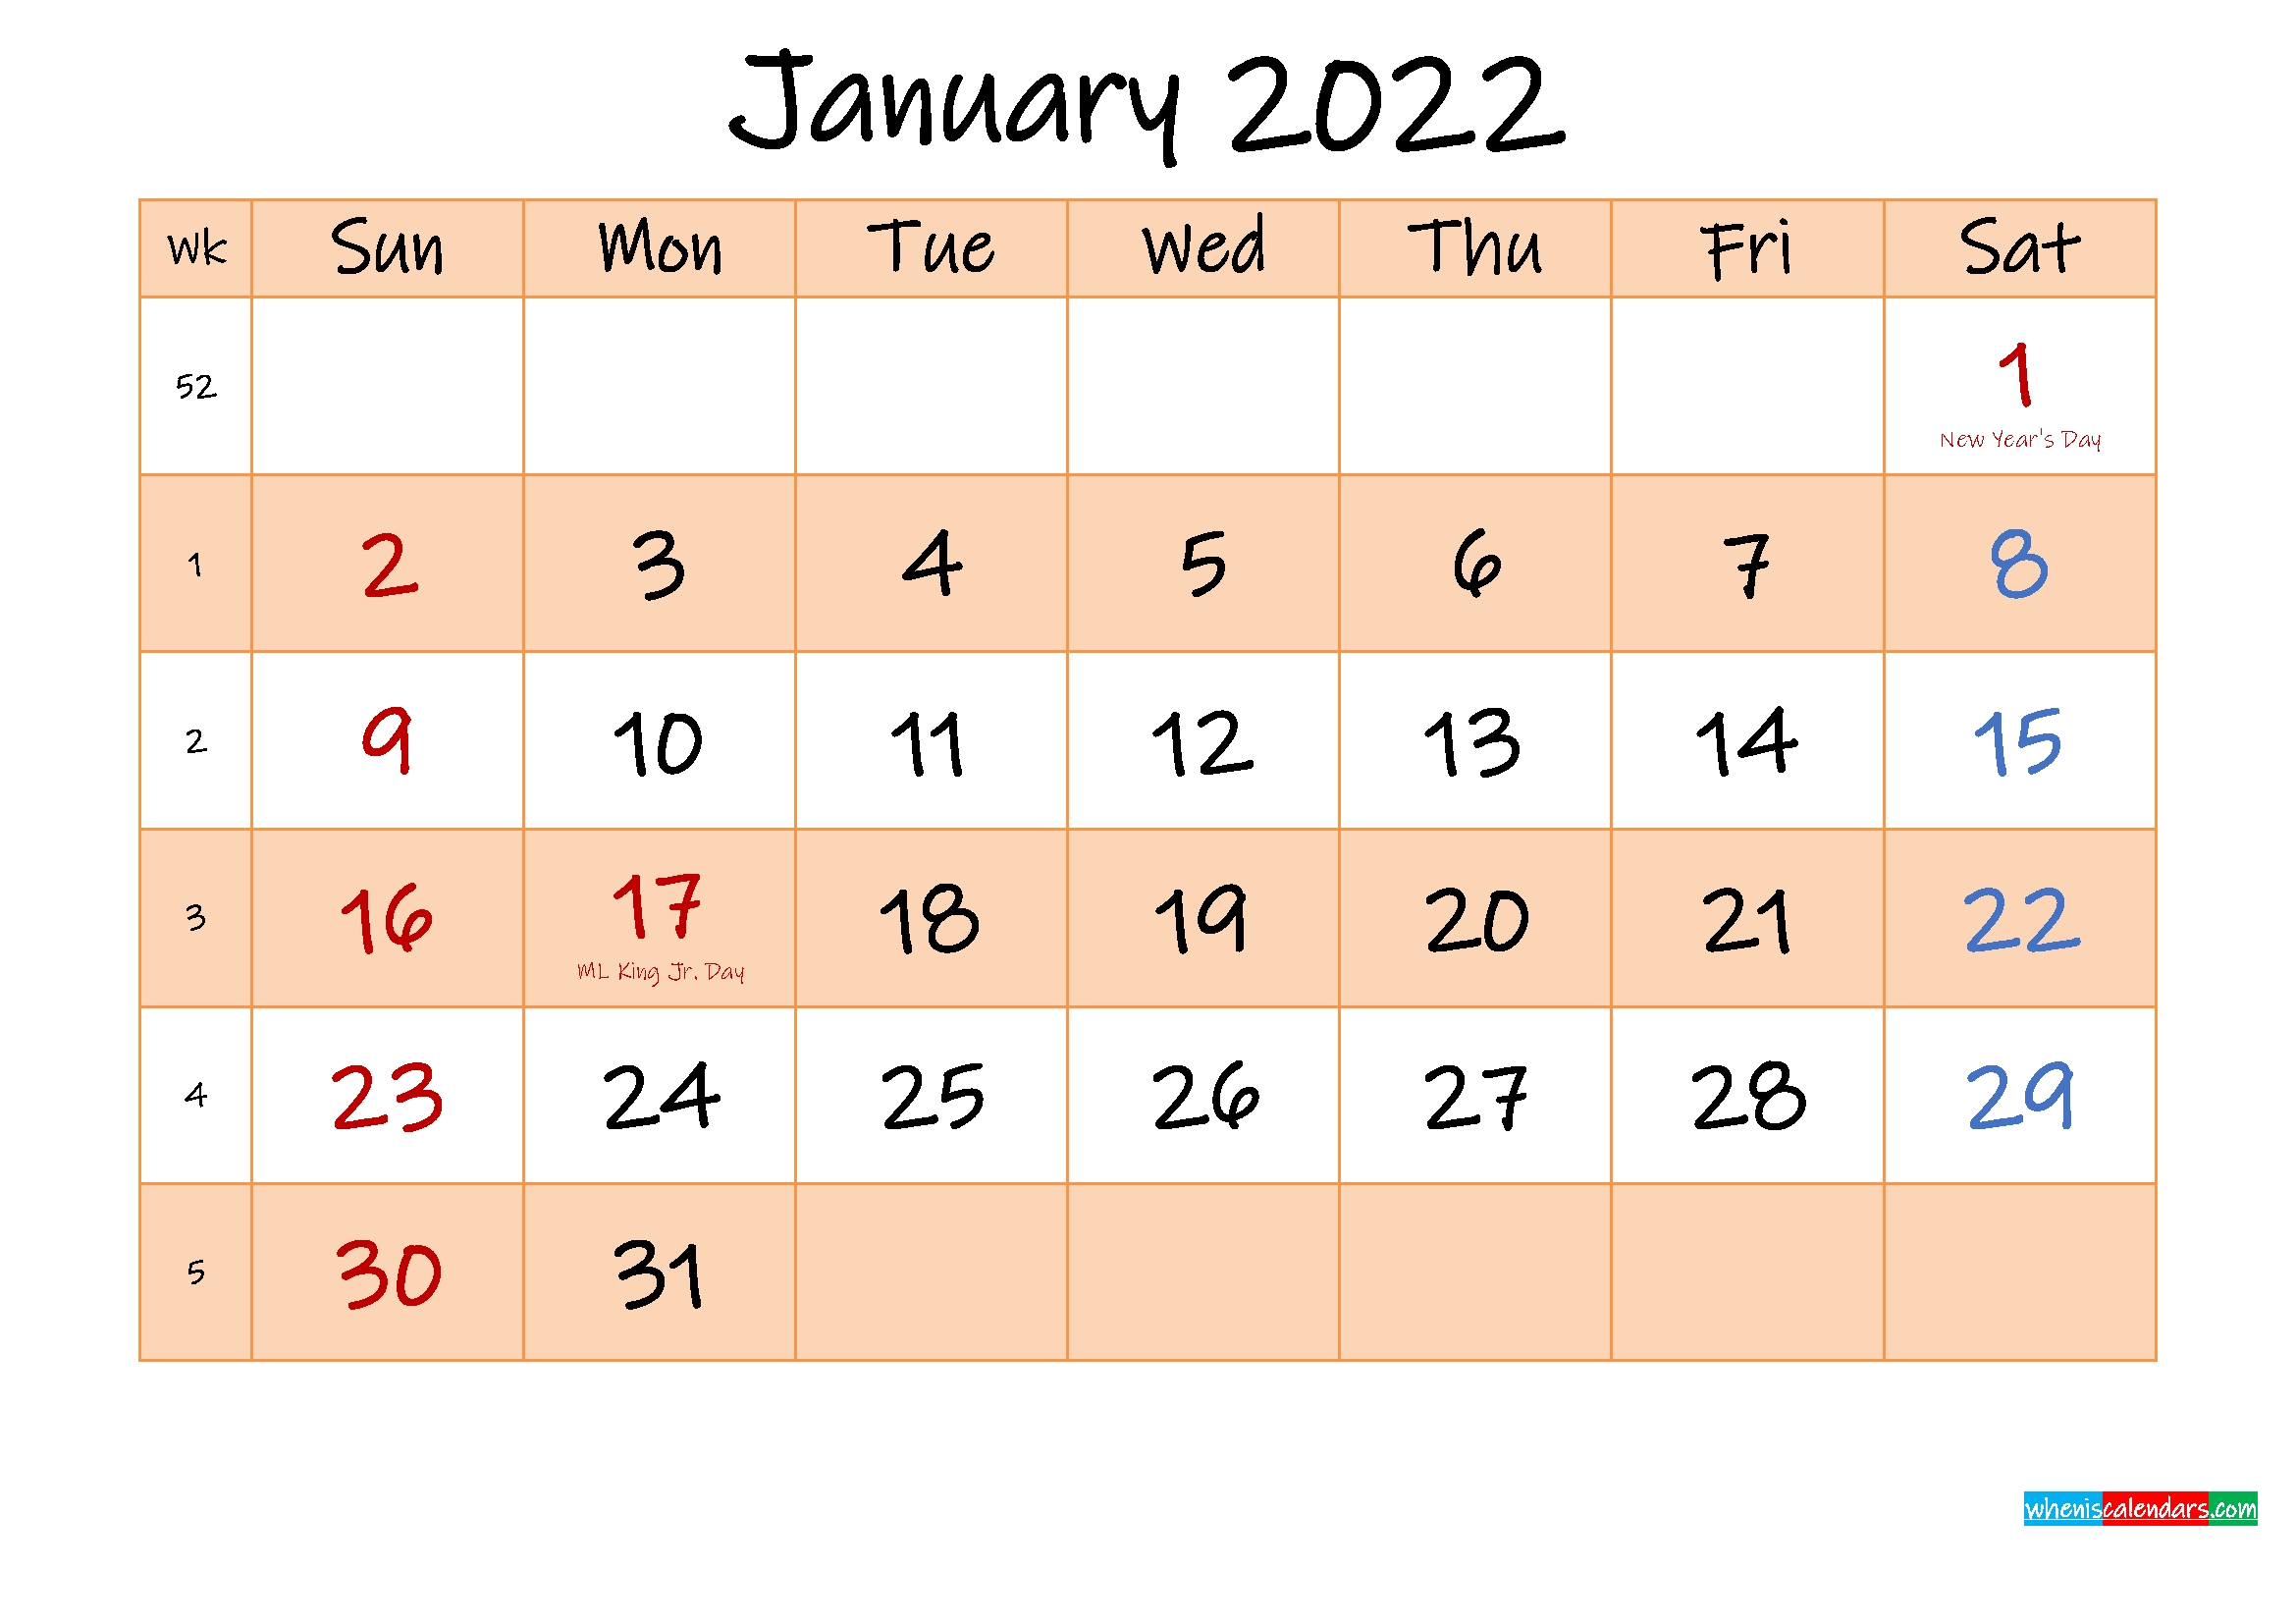 editable january 2022 calendar template noink22m481 free printable 2020 monthly calendar::January 2022 Calendar Canada